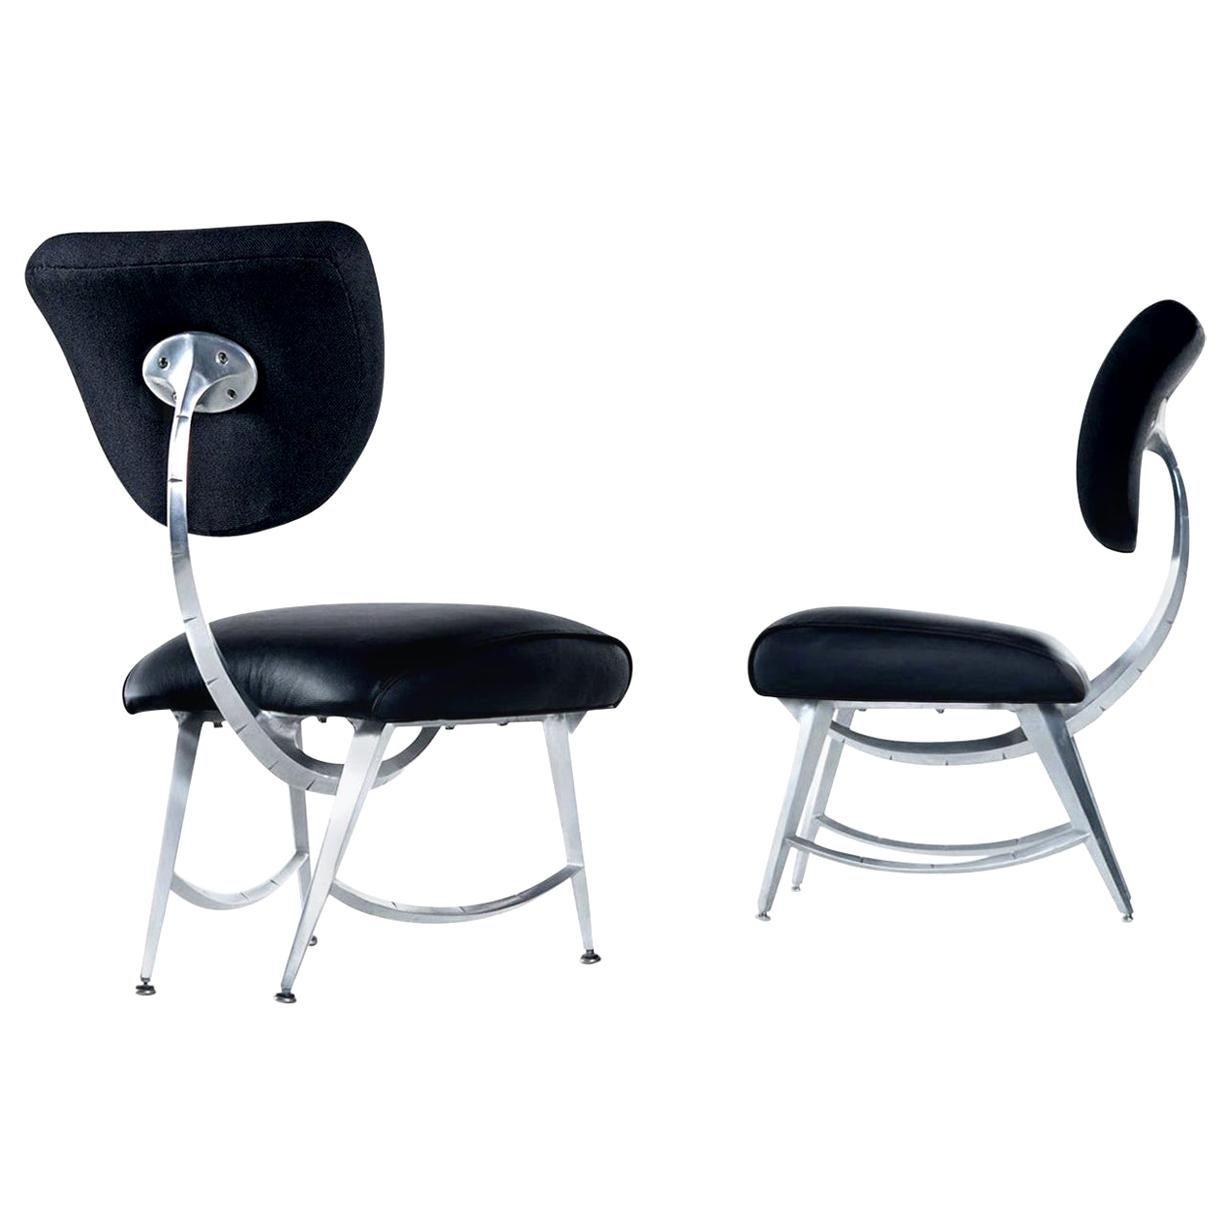 Jordan Mozer for Disney Quest Aluminum Armillary Chairs Set, Fully Restored